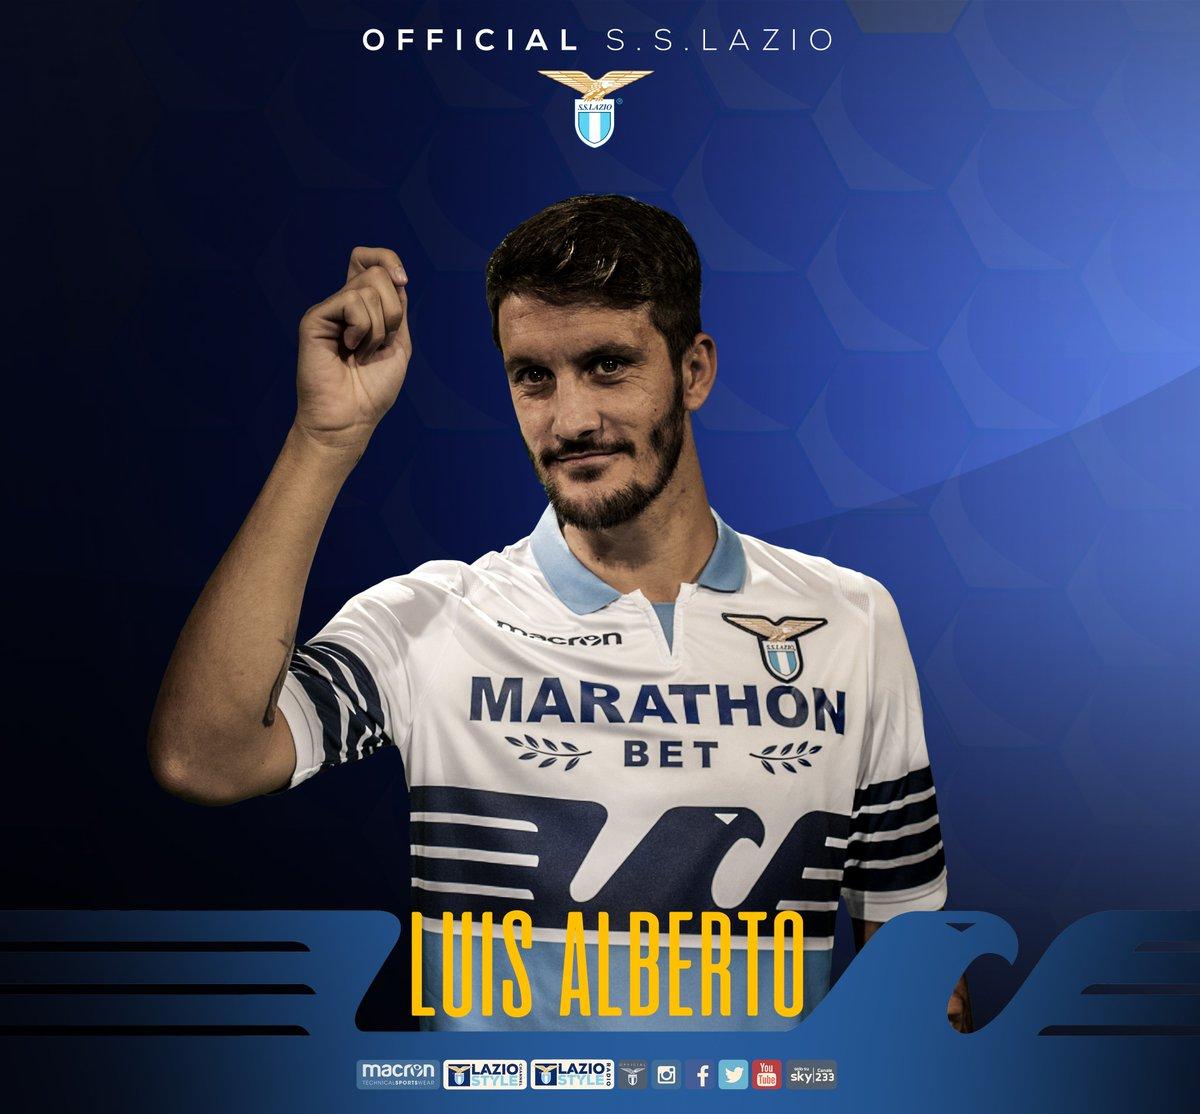 ⏱ 12'   #LazioNovara 1-0  ⚽ GOOOOOOOOOL!!!!!!! GOOOOOOOOOOL!!!!!! 🎩 LA SBLOCCHIAMO SUBITO CON @10_luisalberto!!!!!!